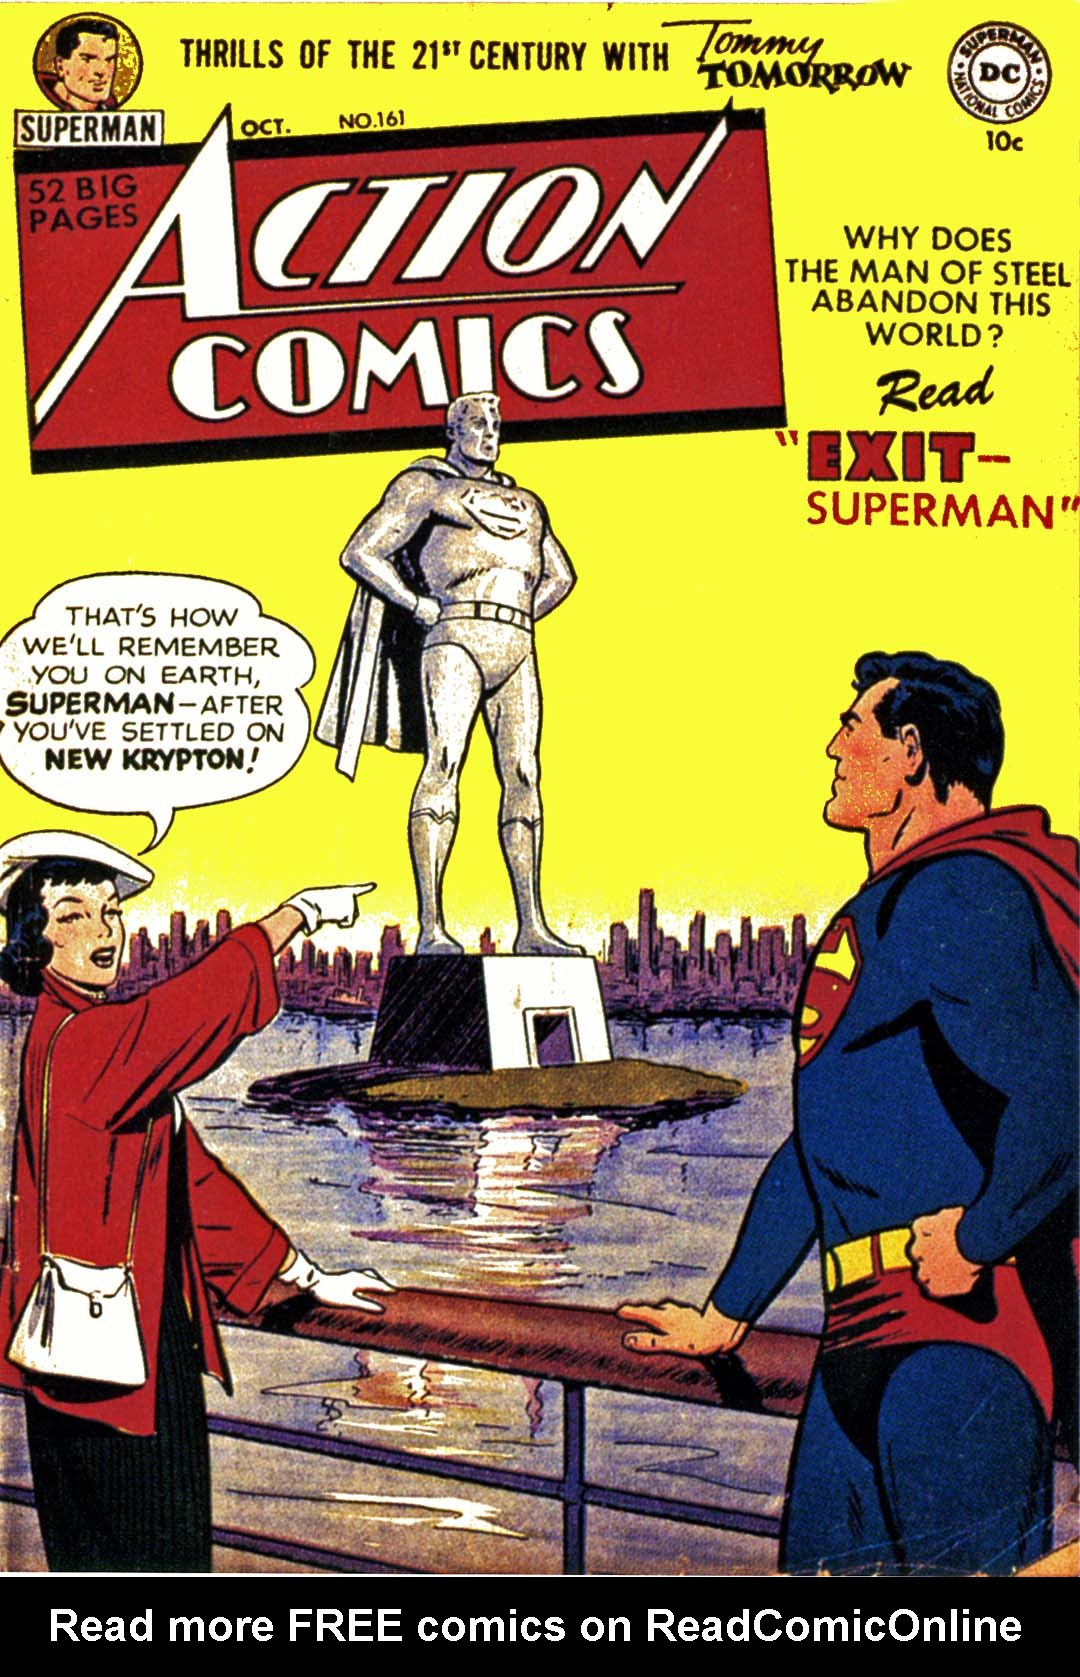 Action Comics (1938) 161 Page 1